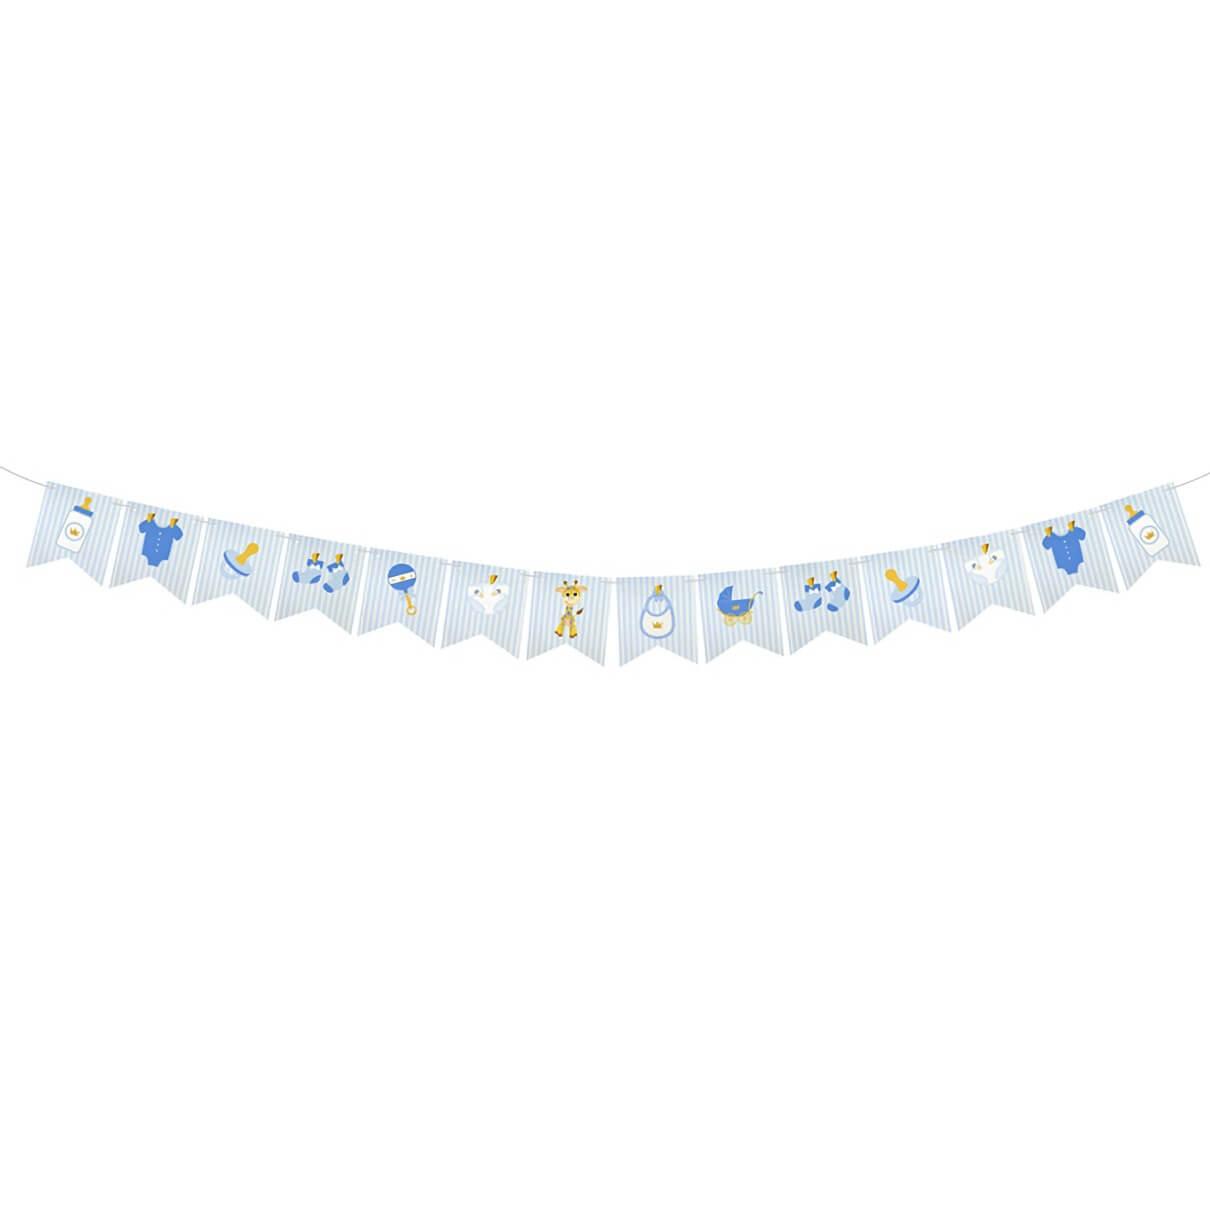 Guirlande fanion baby shower bleu ciel